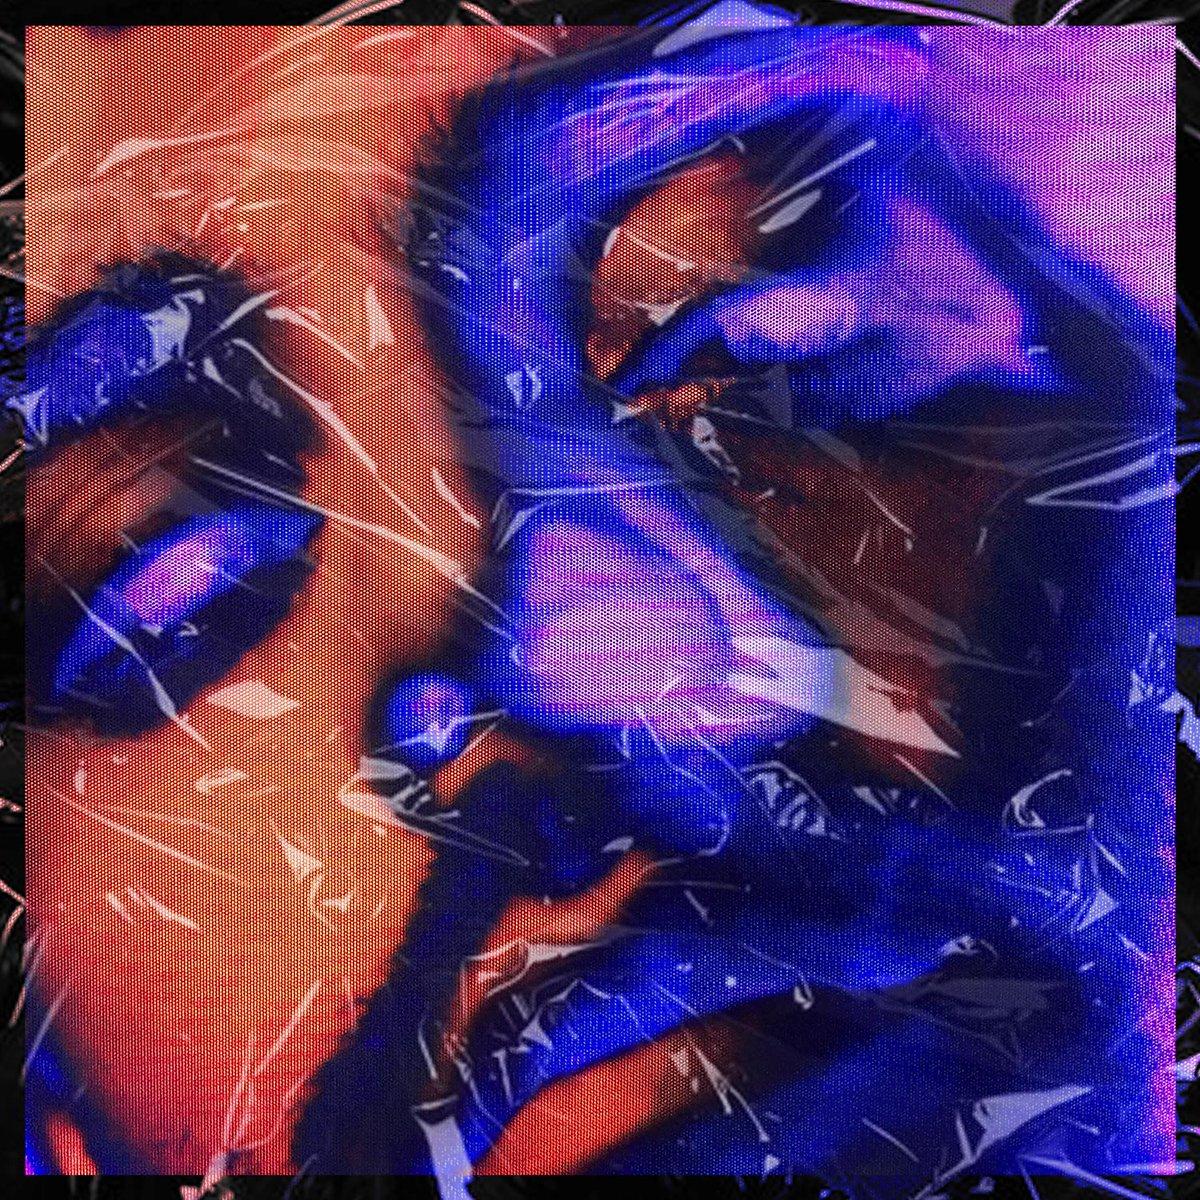 HOPIUM - I FORGET MY NAME (2019)